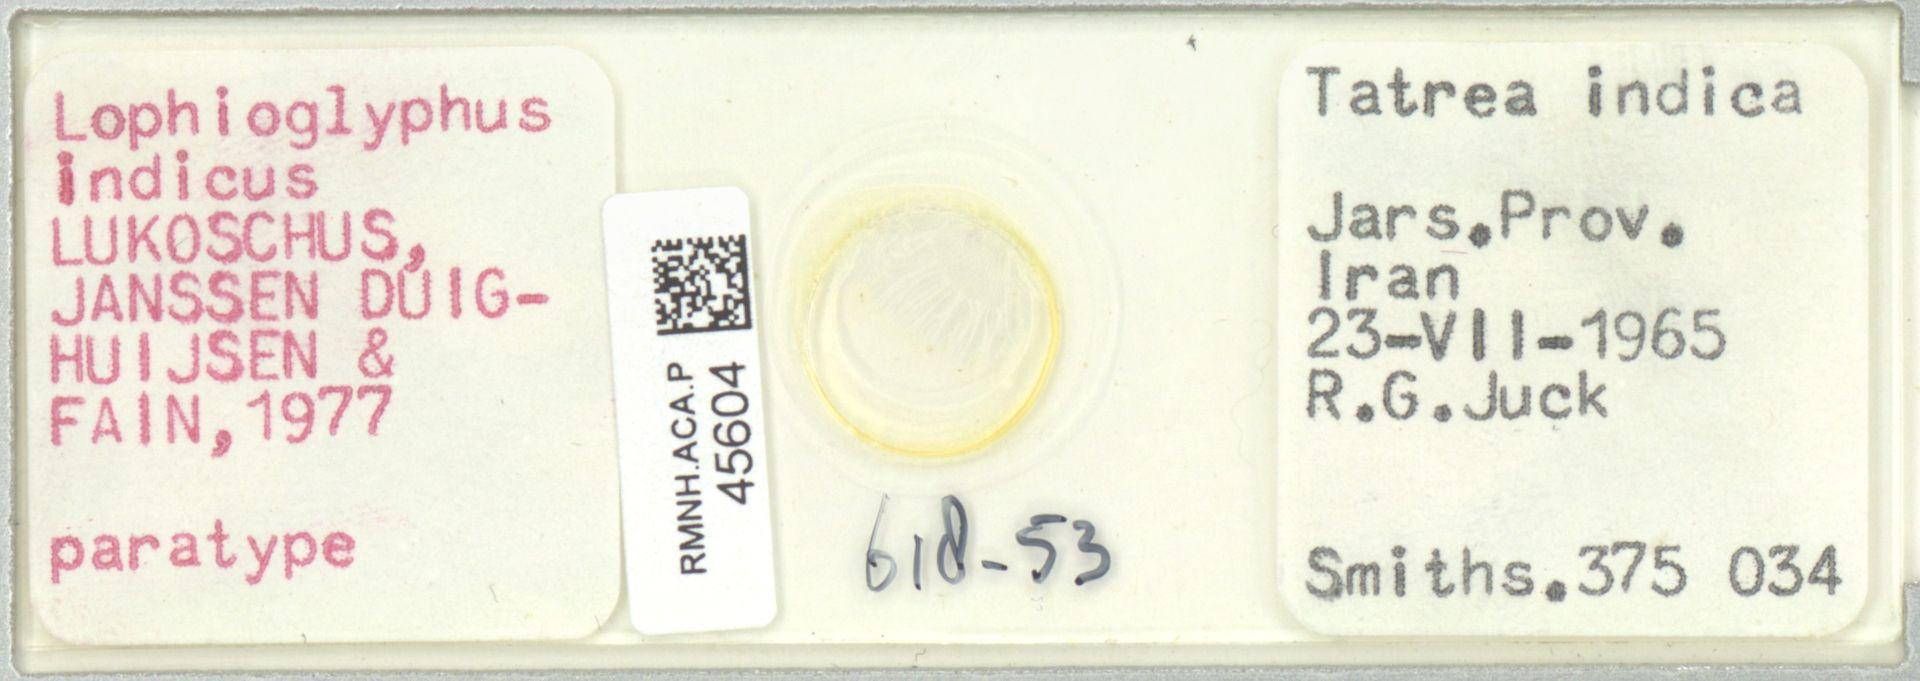 RMNH.ACA.P.45604 | Lophioglyphus indicus Lukoschus, Janssen Duijghuijsen & Fain, 1977